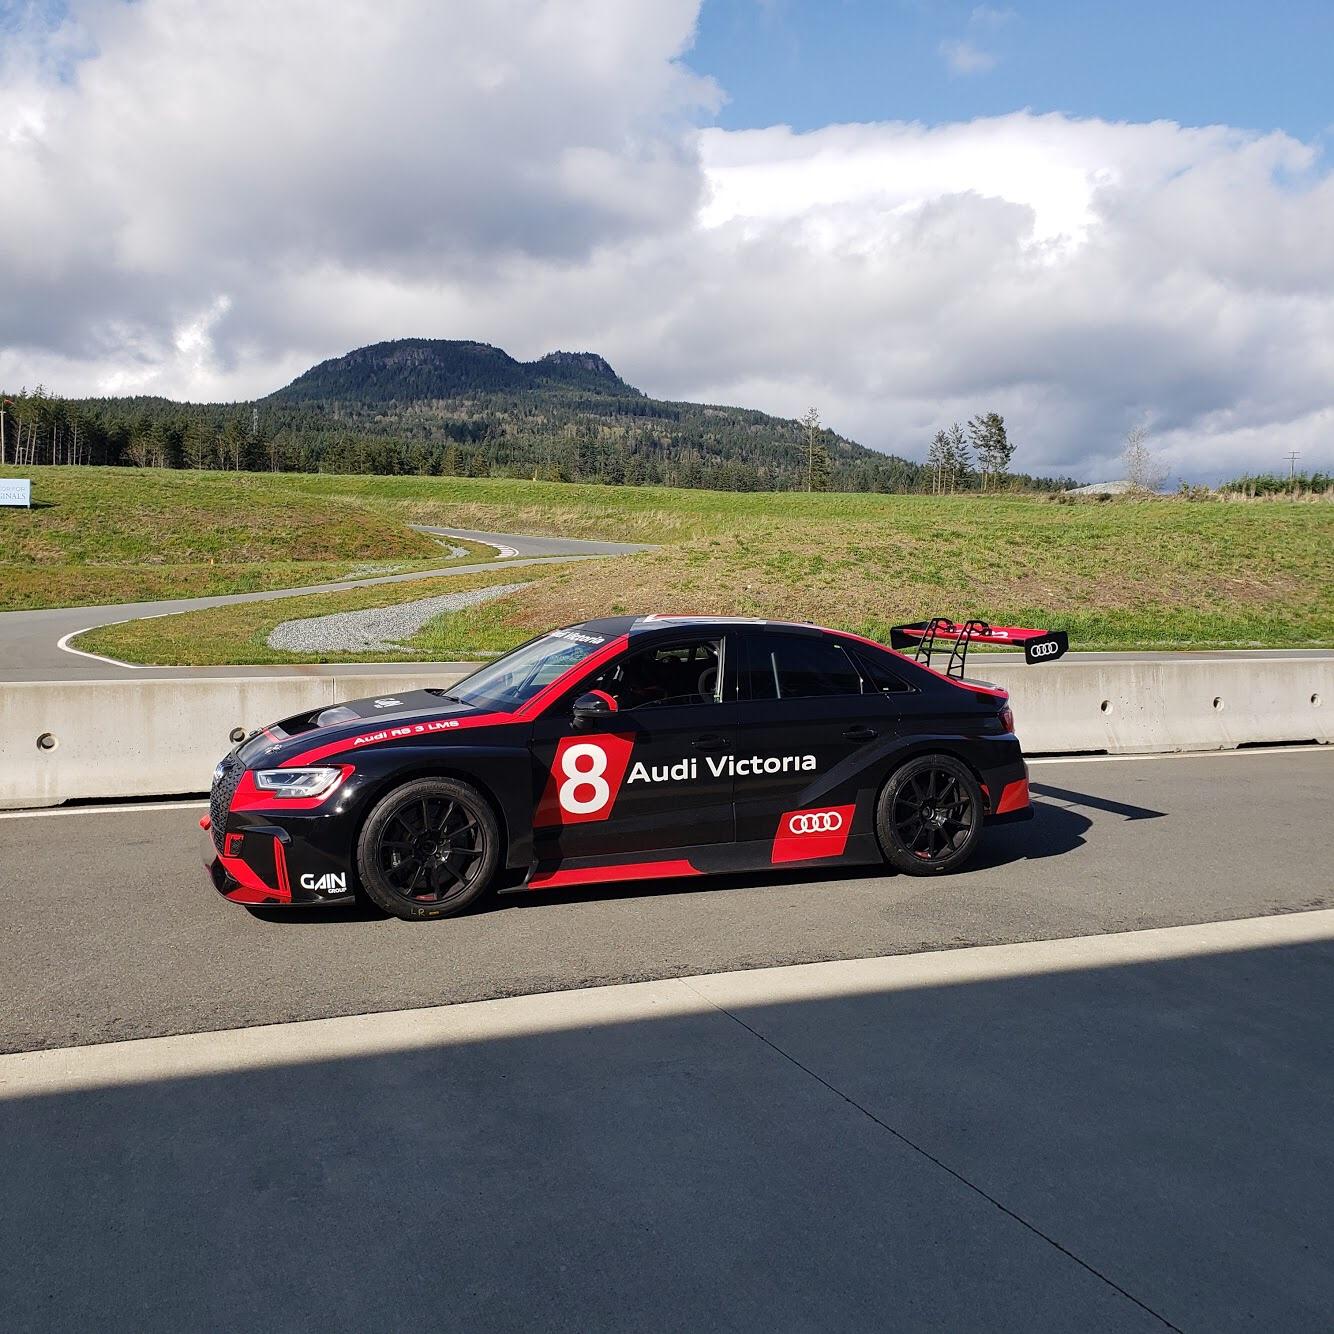 Vancouver Island Motorsport Circuit - BC - Canada - Vancouver Island - Villa Eyrie - Cowichan Tourism - British Columbia